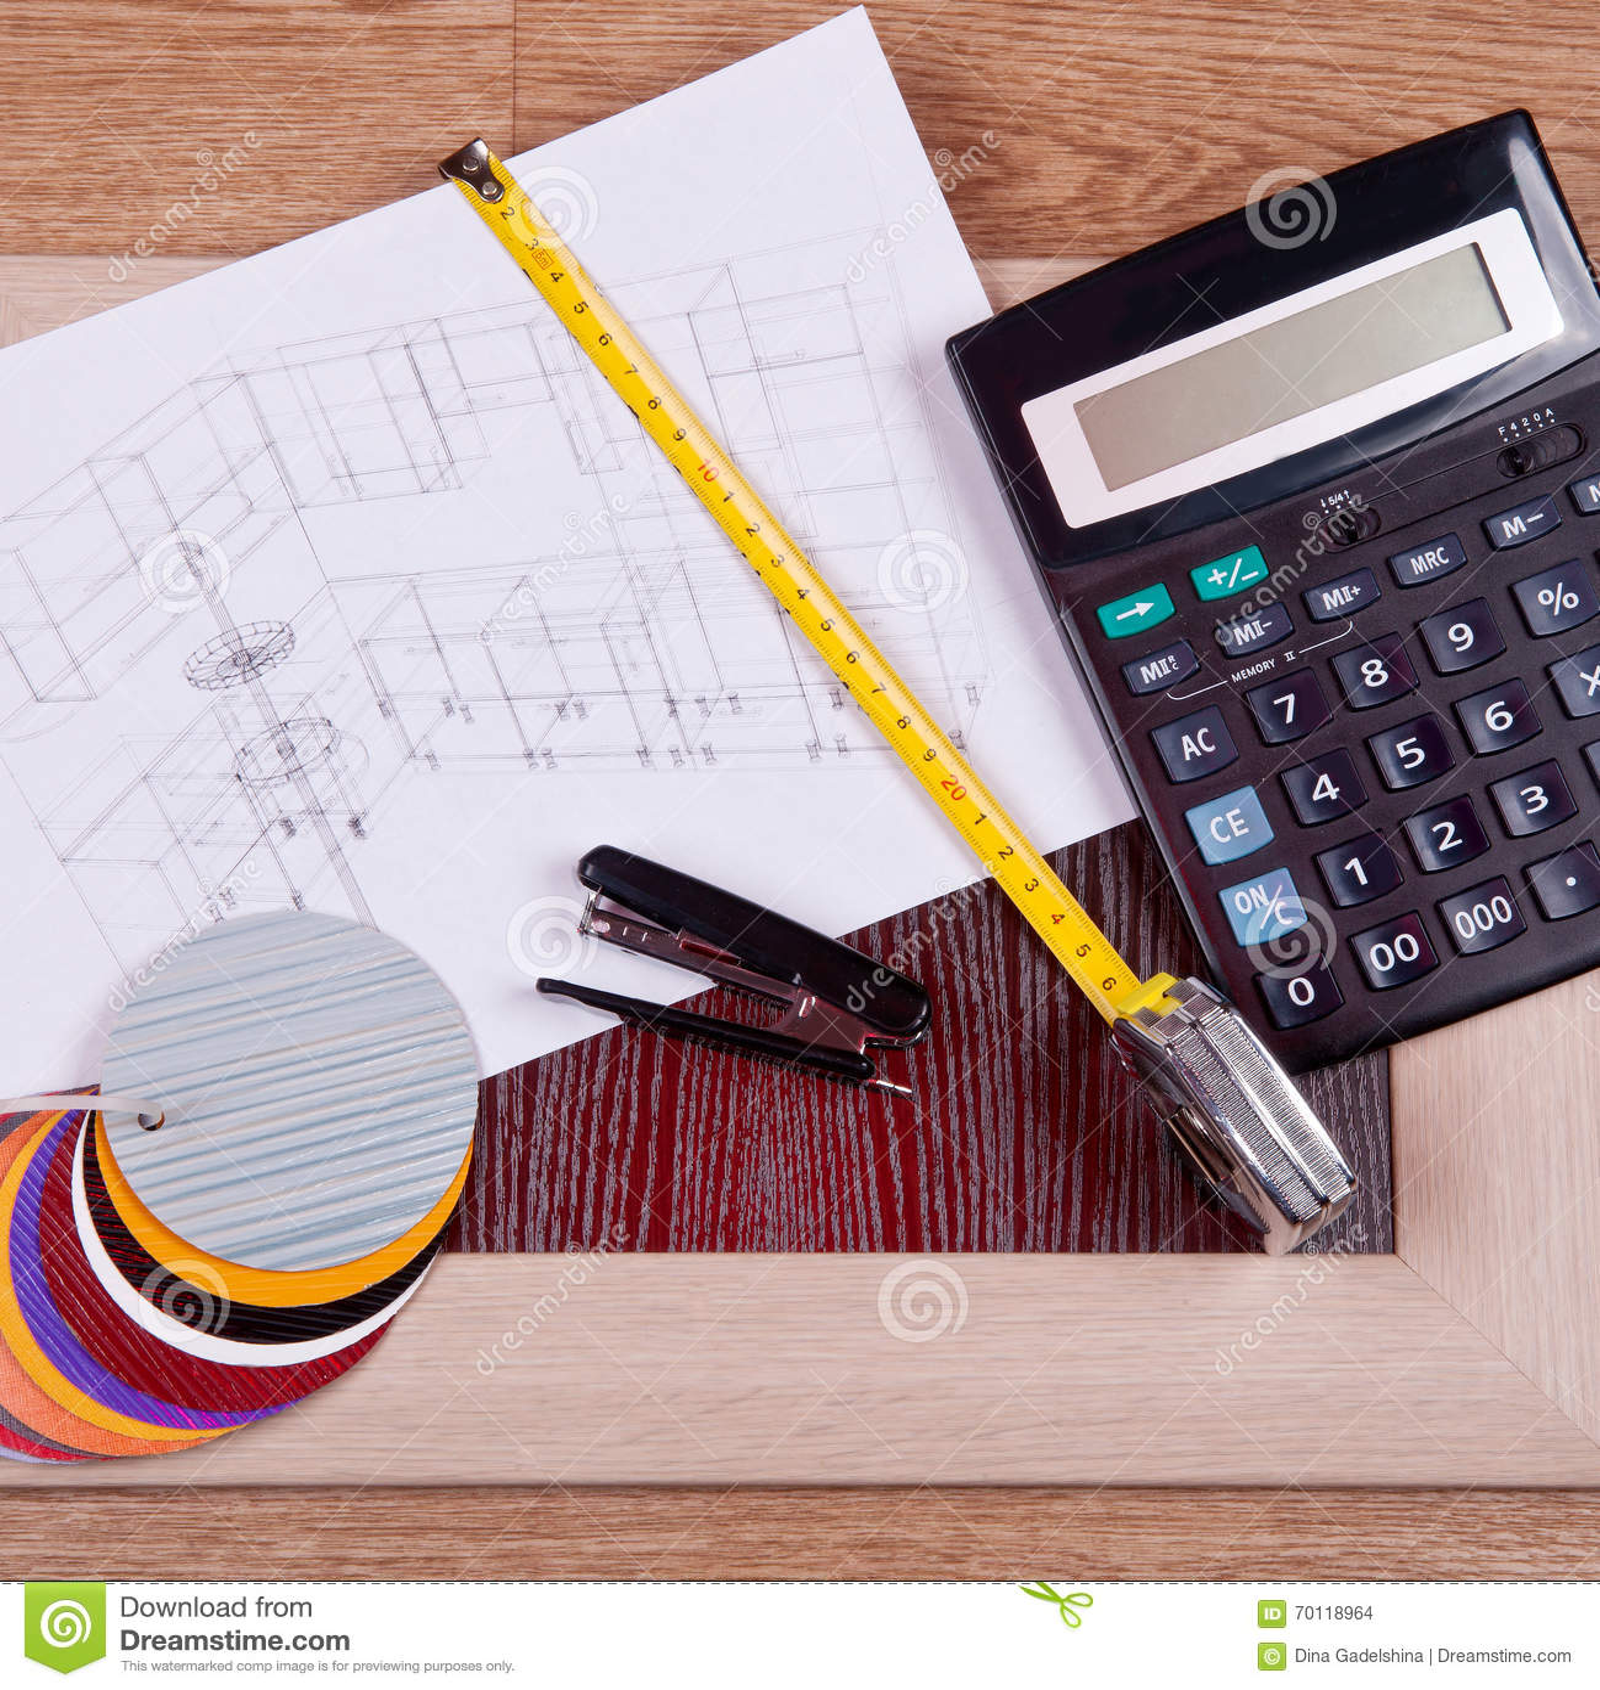 kitchen calculator sink refinishing porcelain 厨房和家具制造的建筑材料设计库存照片 图片包括有部分 颜色 计算器 建筑和建筑设计概念3d厨房项目的形象化建设中与木和塑料盘区 一个计算器和一个色板显示在模糊的图